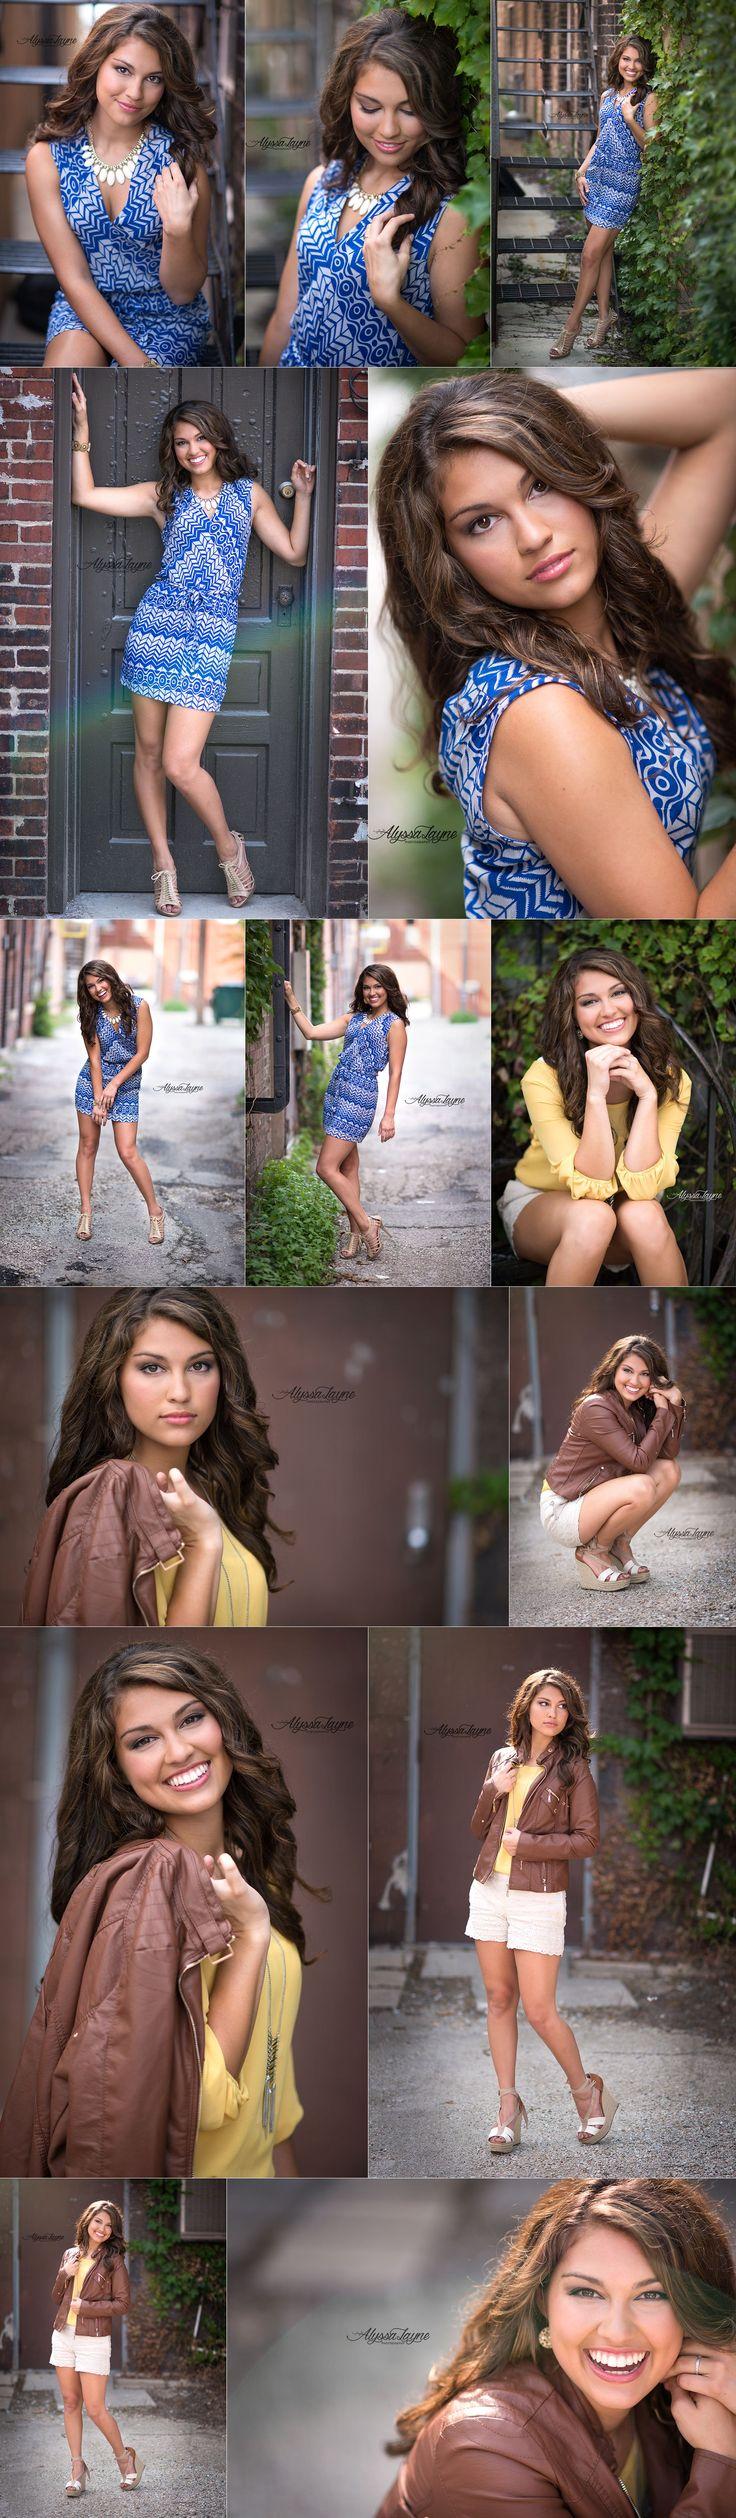 Senior Pictures   Jessica   Senior Pose   Illinois Senior Pictures   Alyssa Layne Photography